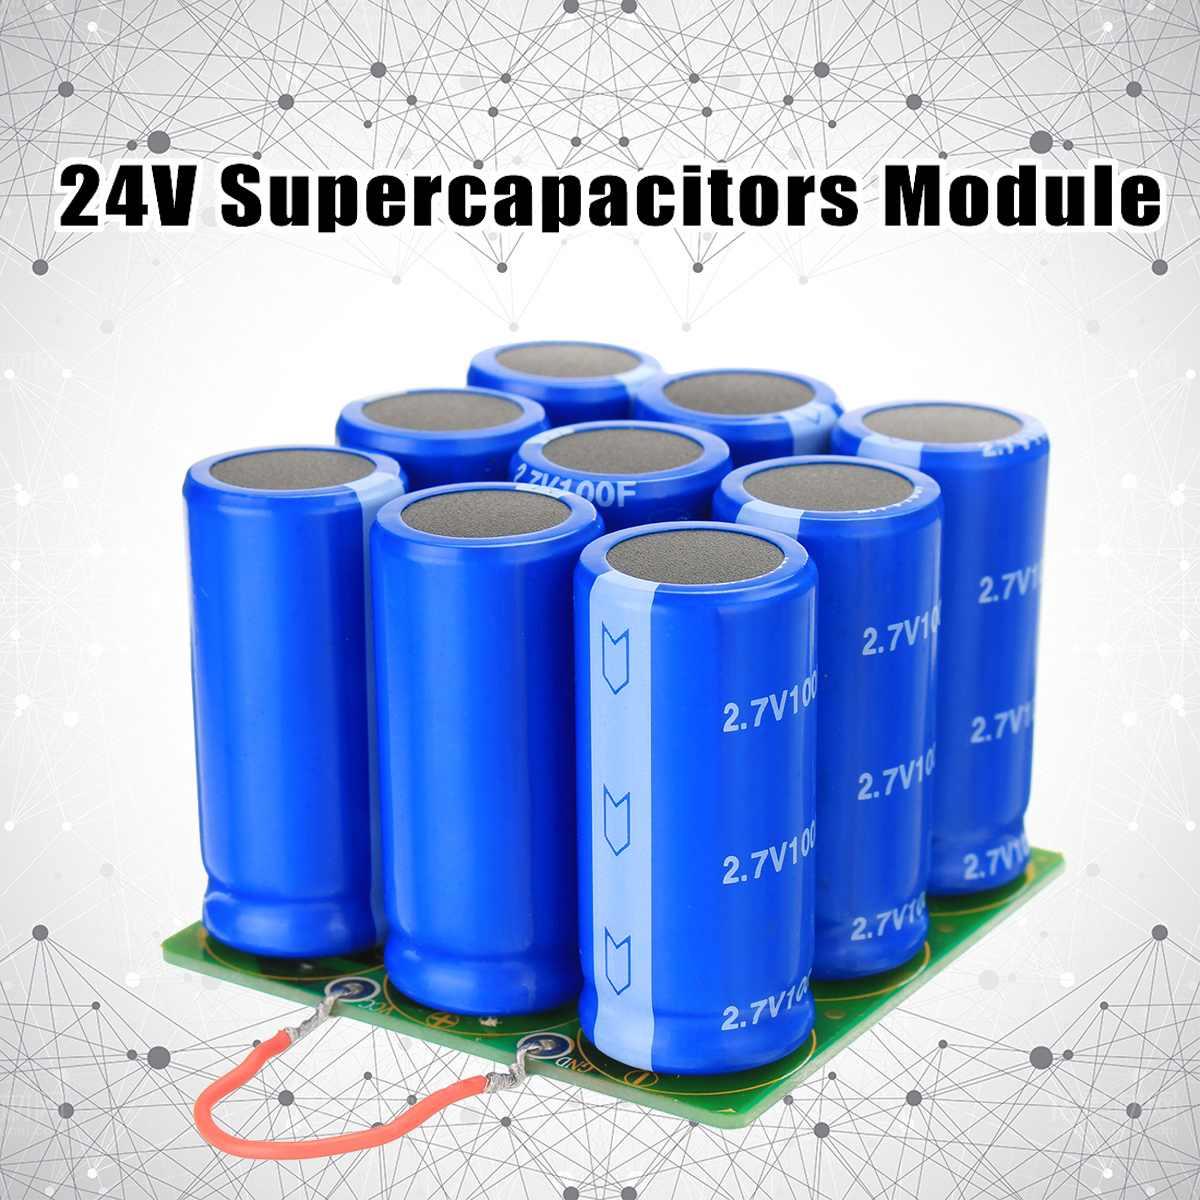 24V Supercapacitors Module Start Power Motor Start Super Farad Capacitor module 9X 2.7V 100F Electronic Components Supplies24V Supercapacitors Module Start Power Motor Start Super Farad Capacitor module 9X 2.7V 100F Electronic Components Supplies